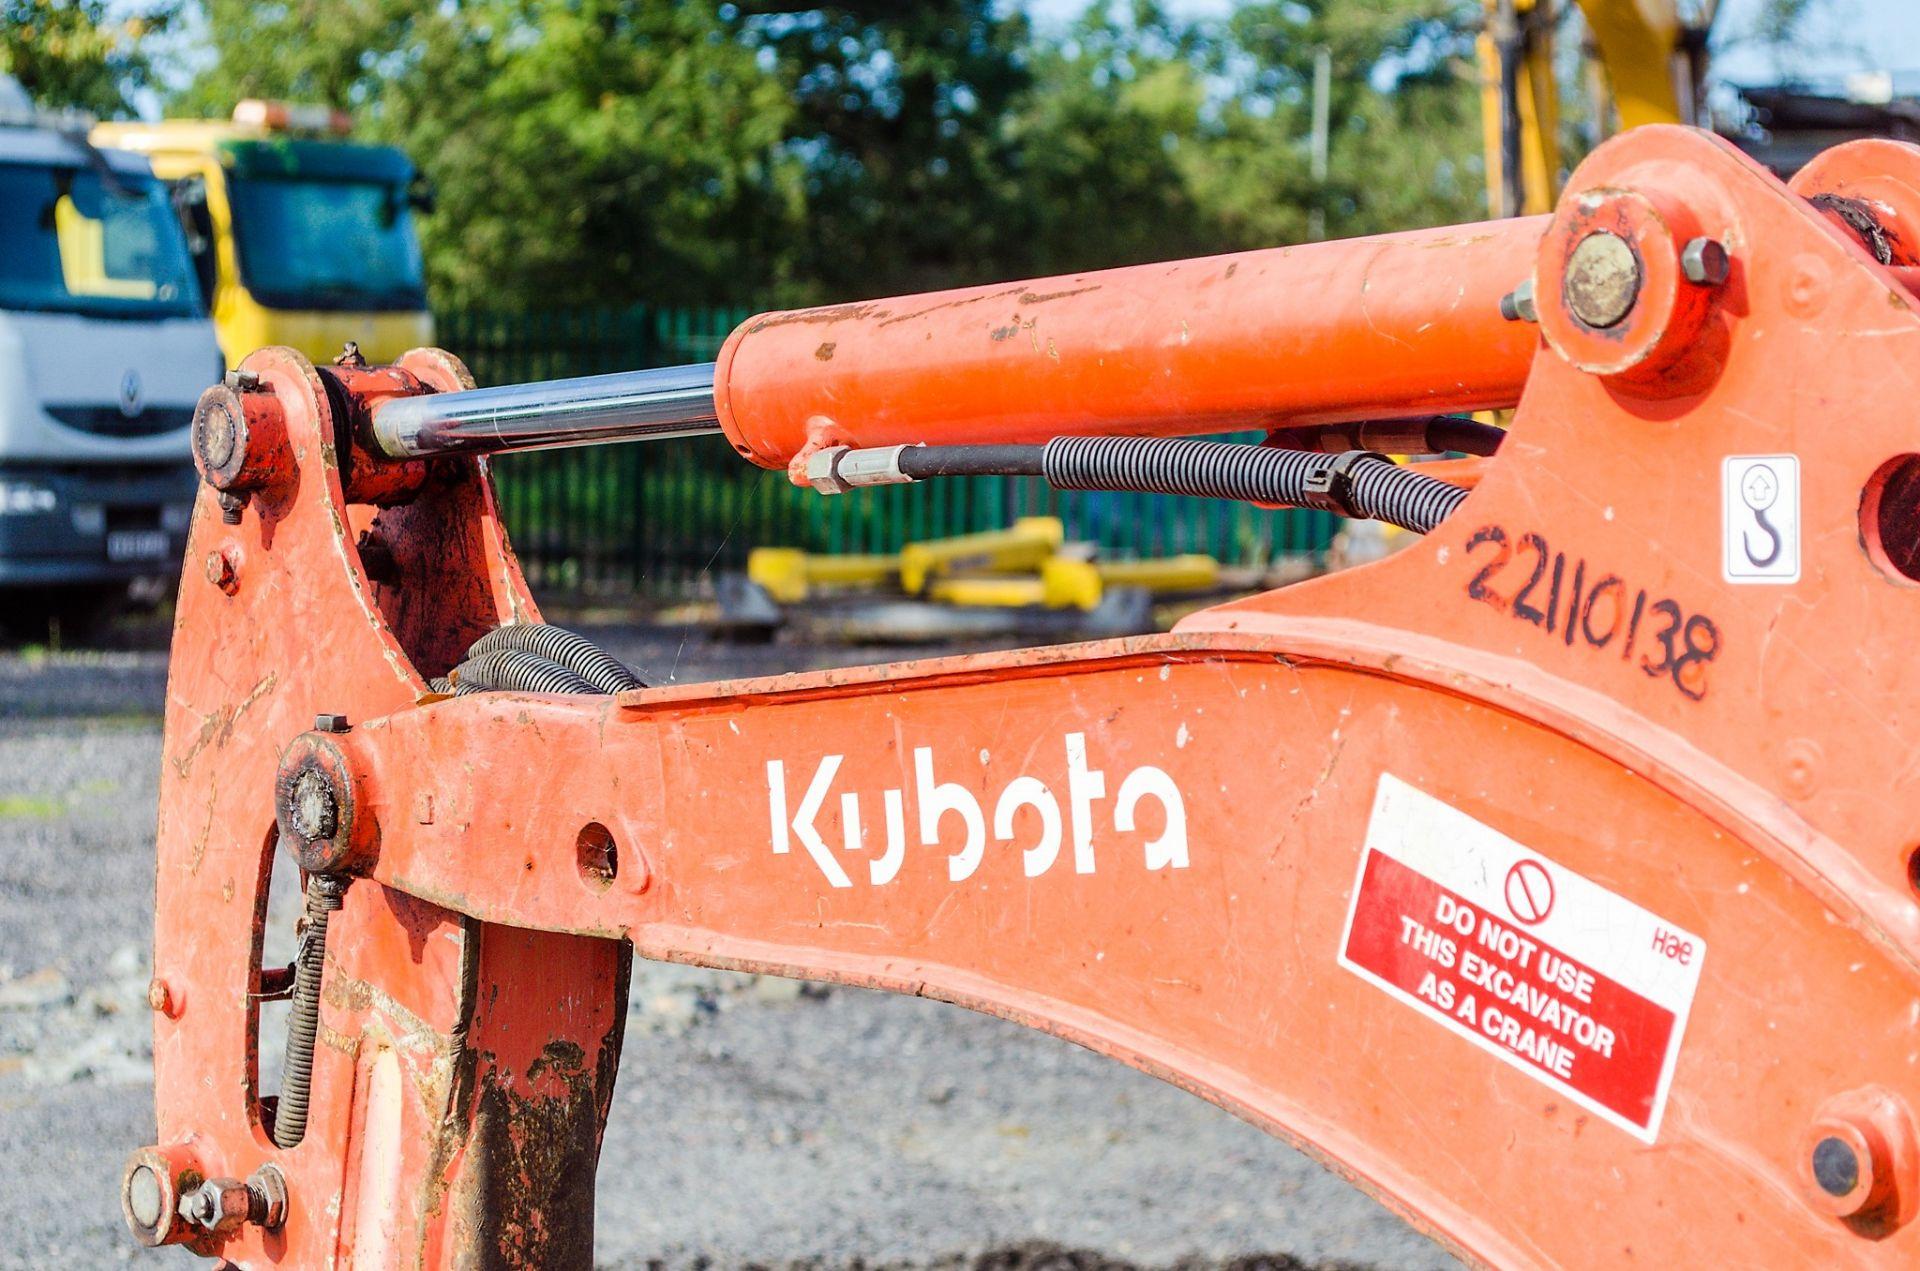 Lot 21 - Kubota KX36-3 1.5 tonne rubber tracked mini excavator Year: 2004 S/N: Z055397 Recorded Hours: 3716